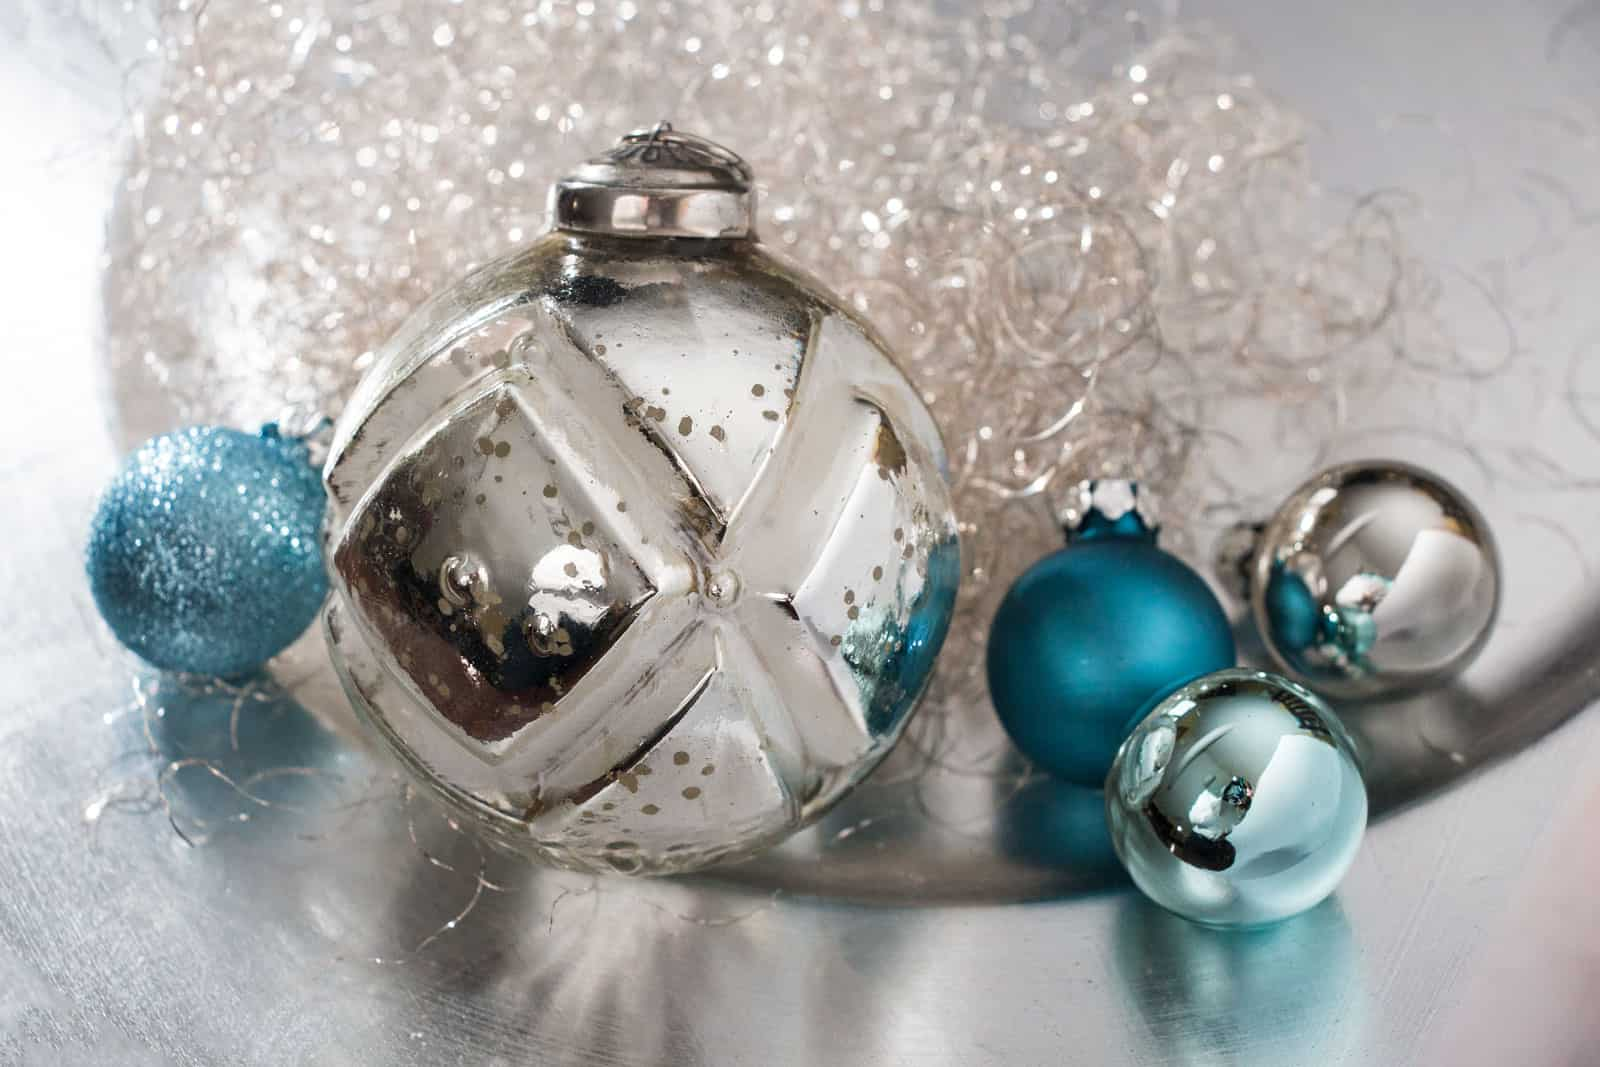 Wallpaper Hd Mickey Mouse Weihnachtskugeln Blau Christbaumkugeln In Blaut 246 Nen